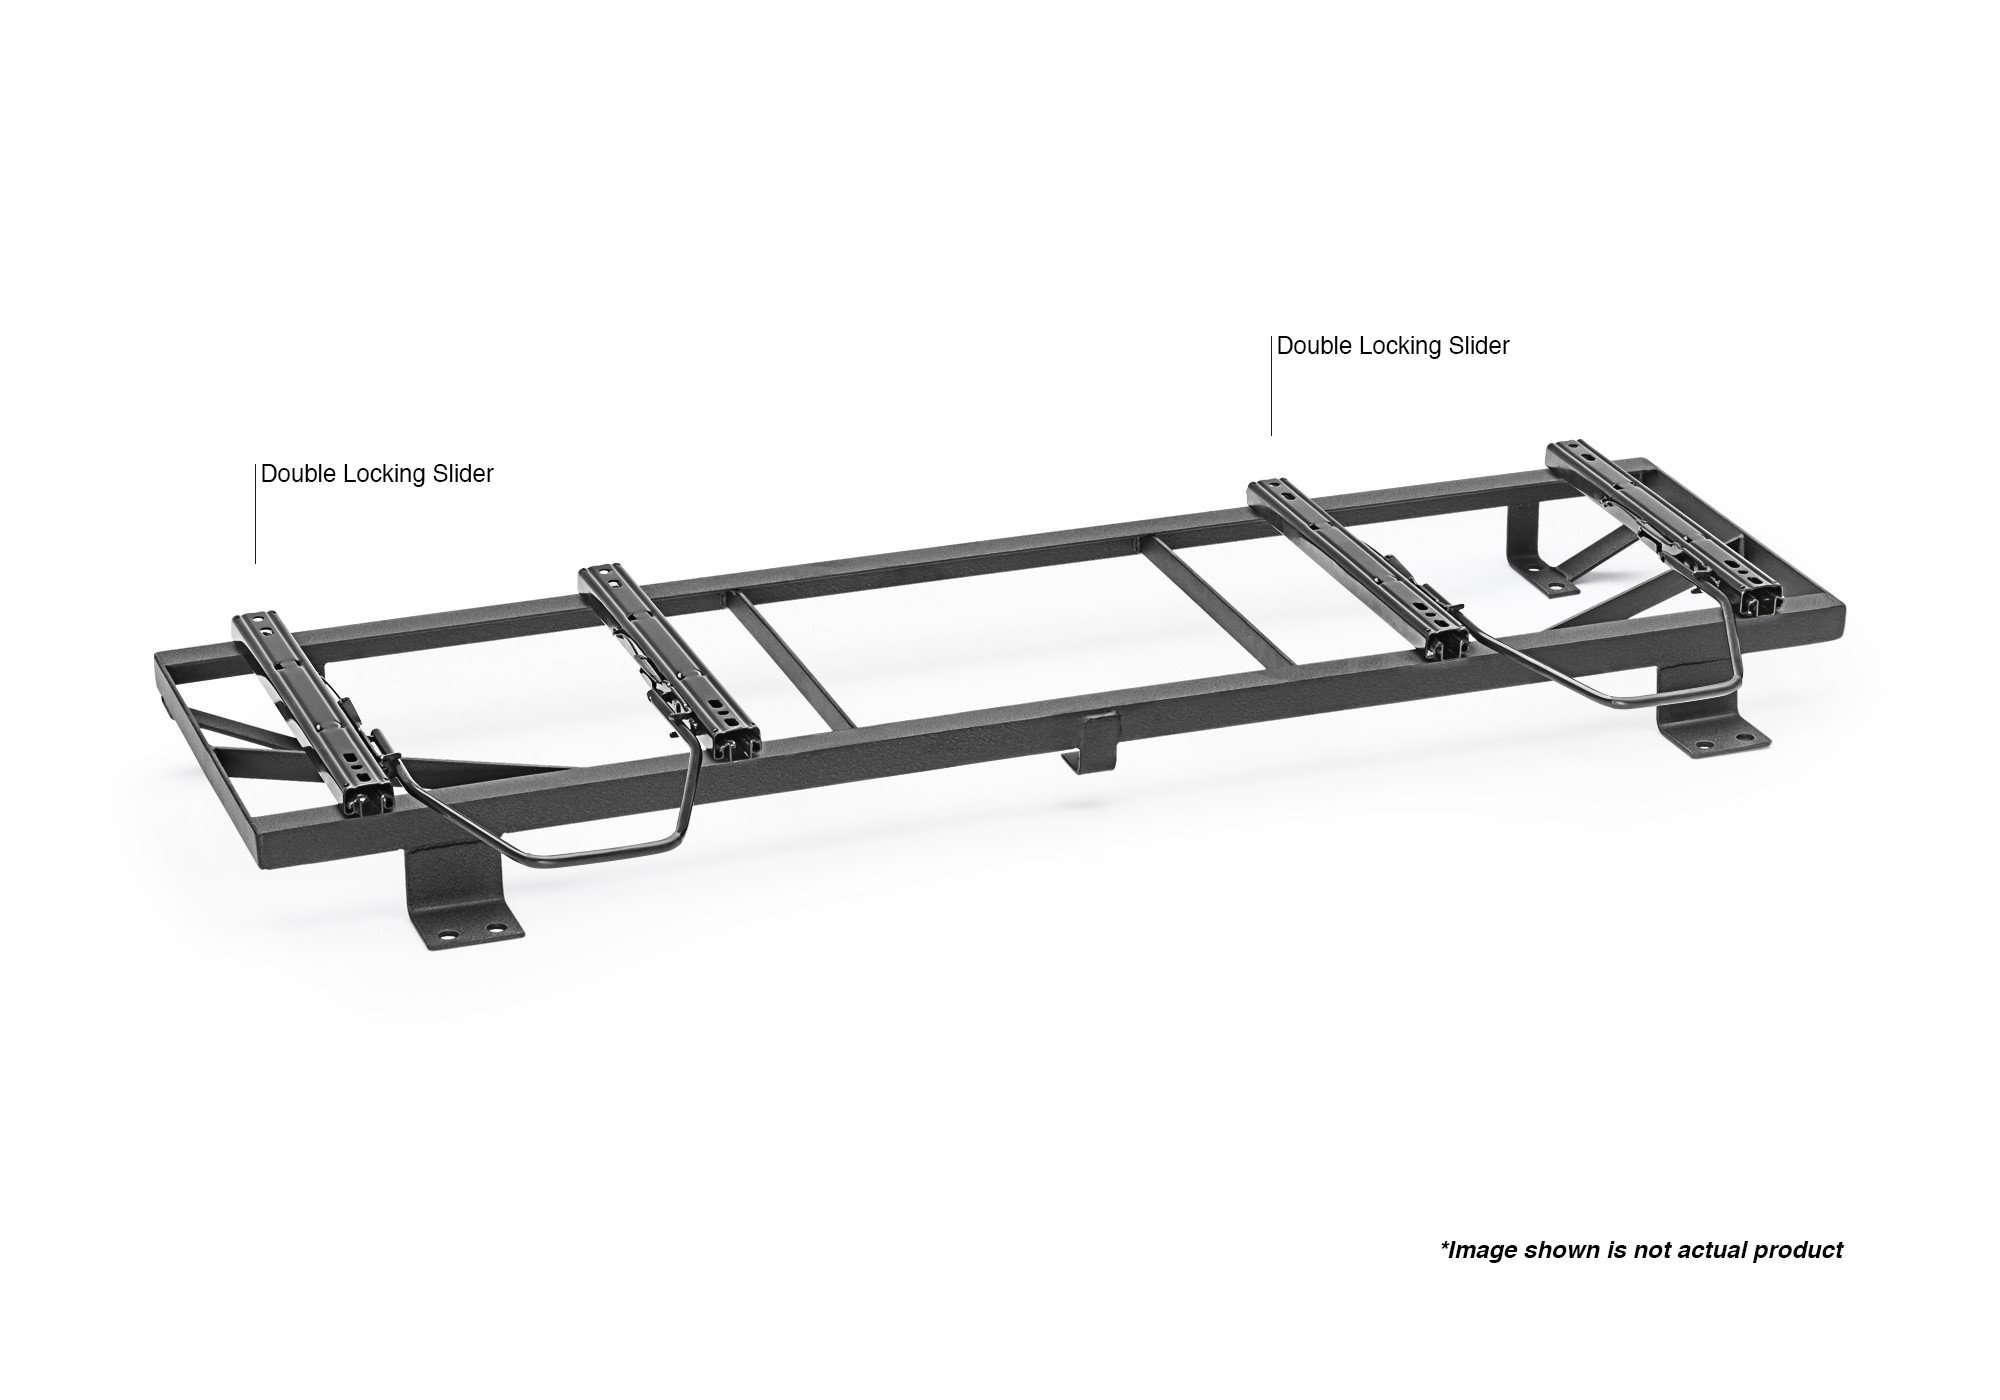 toyota landcruiser fj55 68-7  80 seat bracket